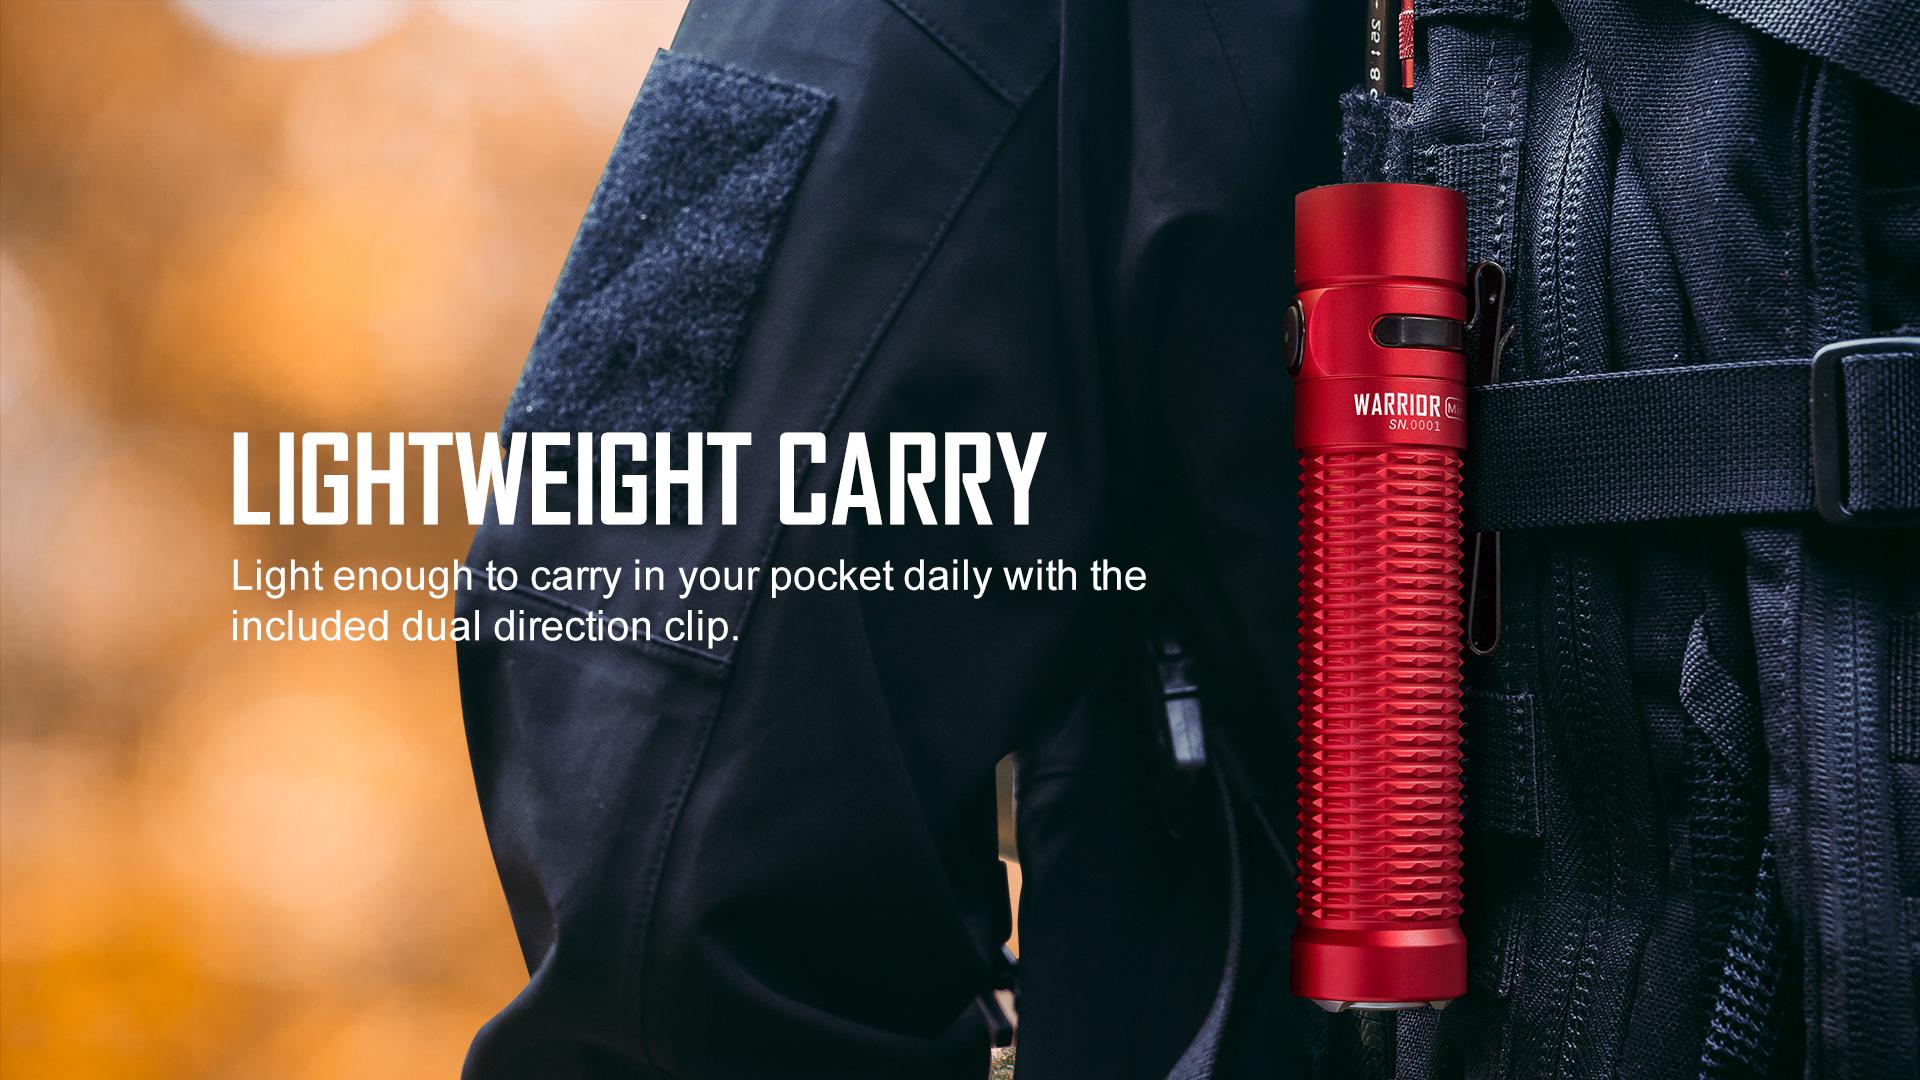 warrior mini,tactical torch,christmas sale,olight uk